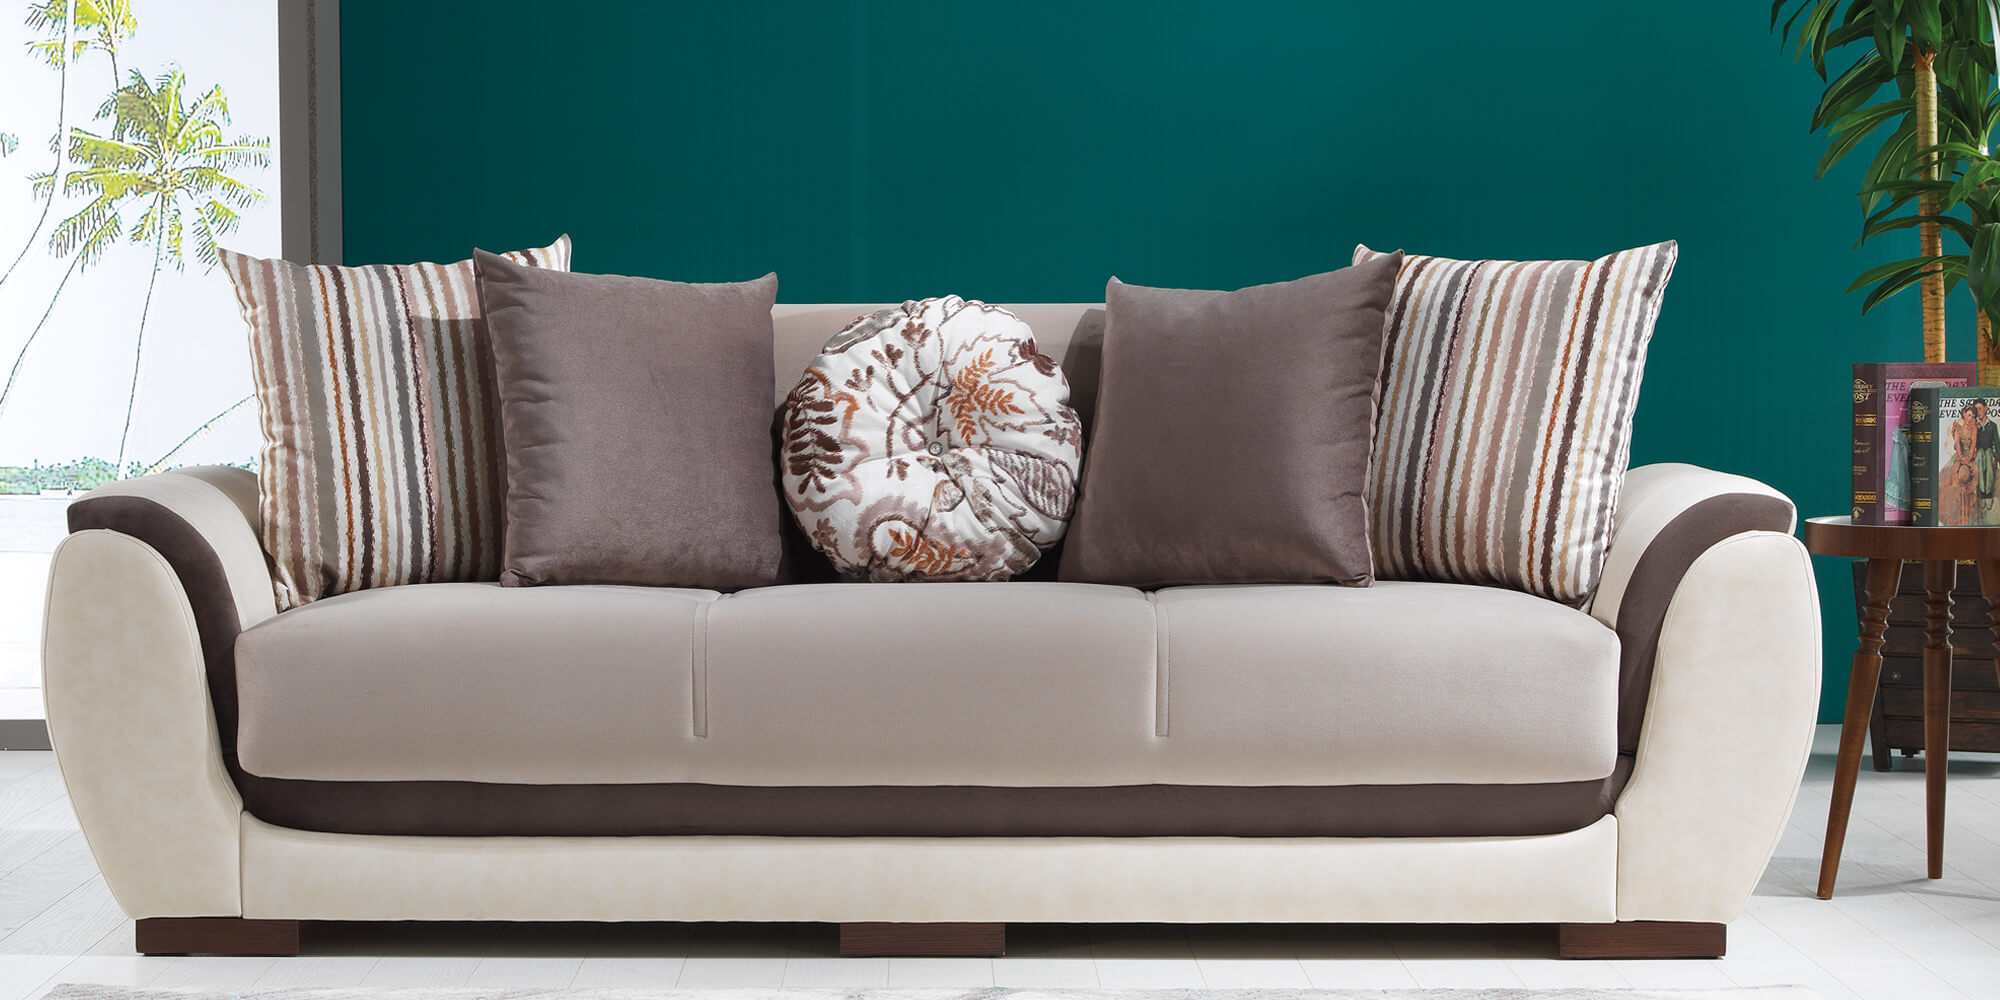 deserto 3 2 1 delux sofa set yuvam m belhaus in wuppertal cilek offizieller h ndler in europa. Black Bedroom Furniture Sets. Home Design Ideas